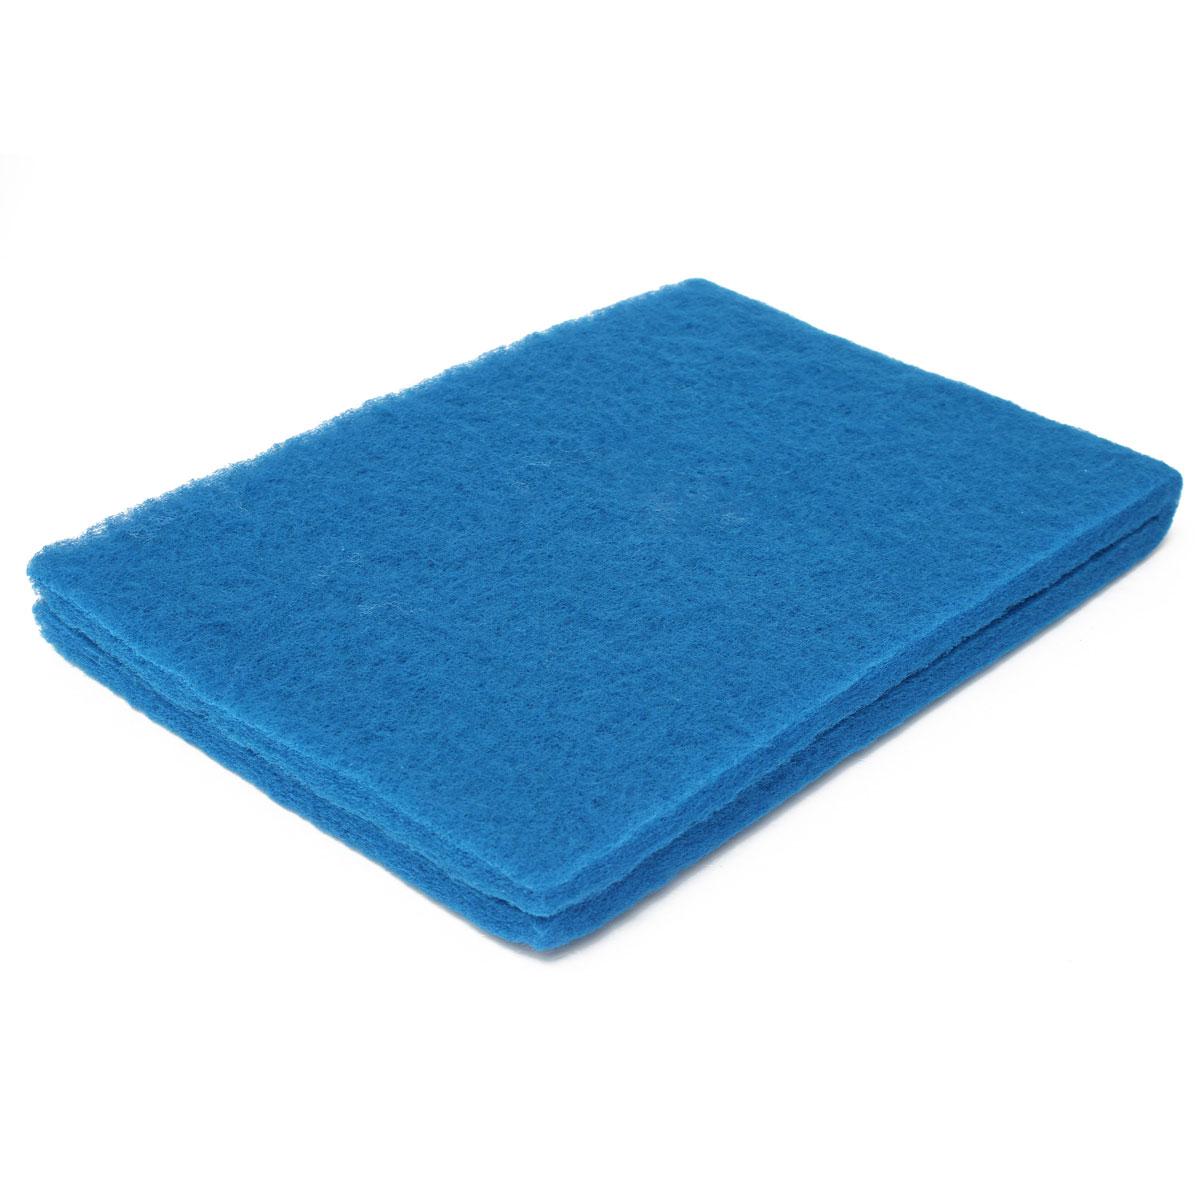 Fish tank filter foam foam sponge cotton pad filter for Pond pump filter sponge